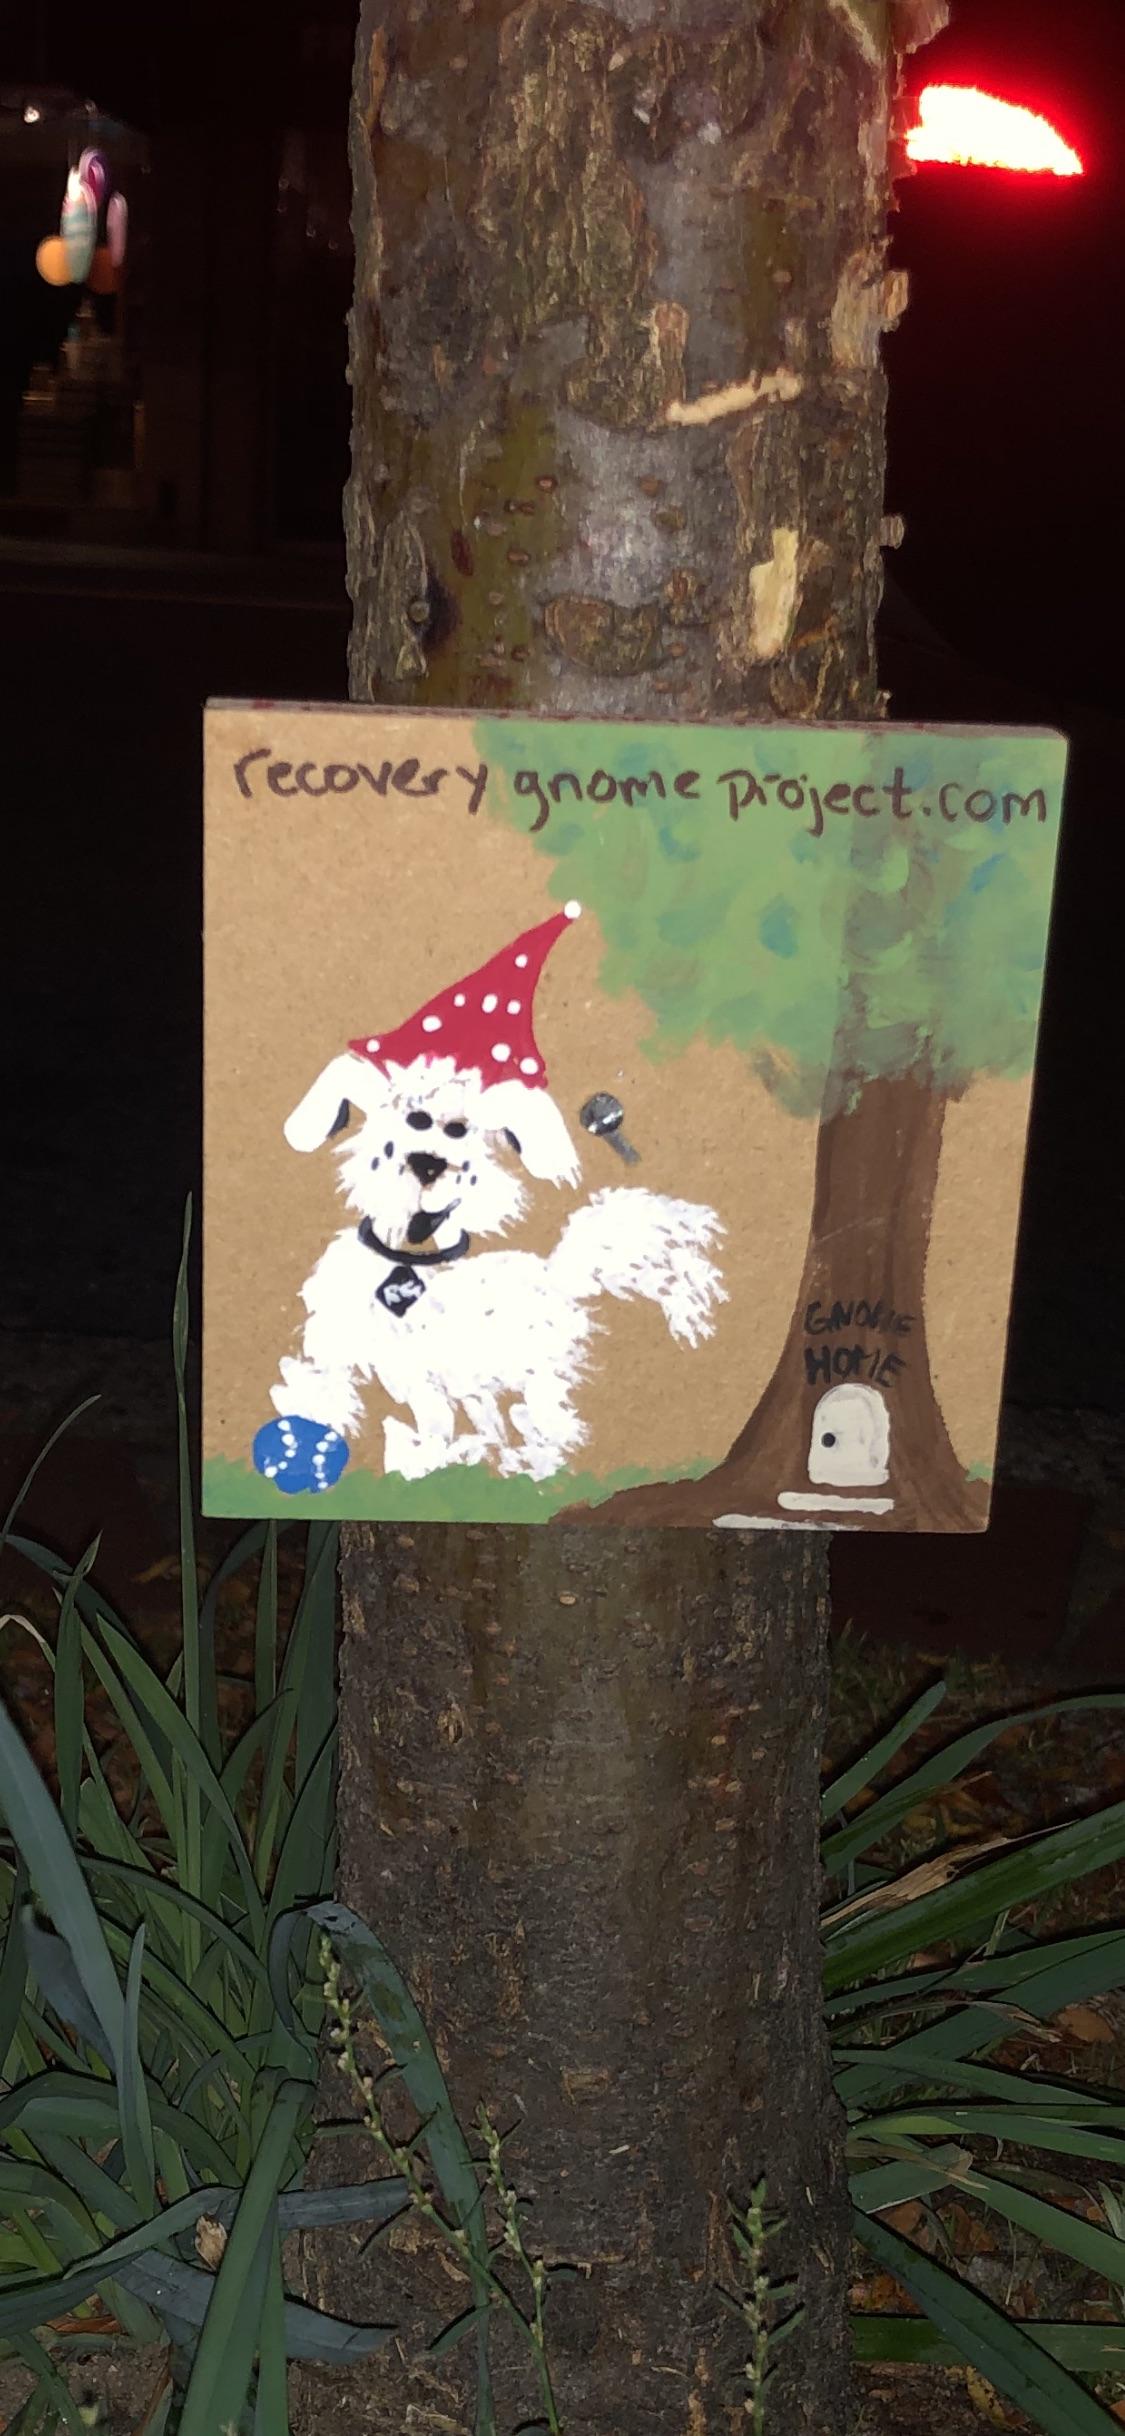 Monty Gnome